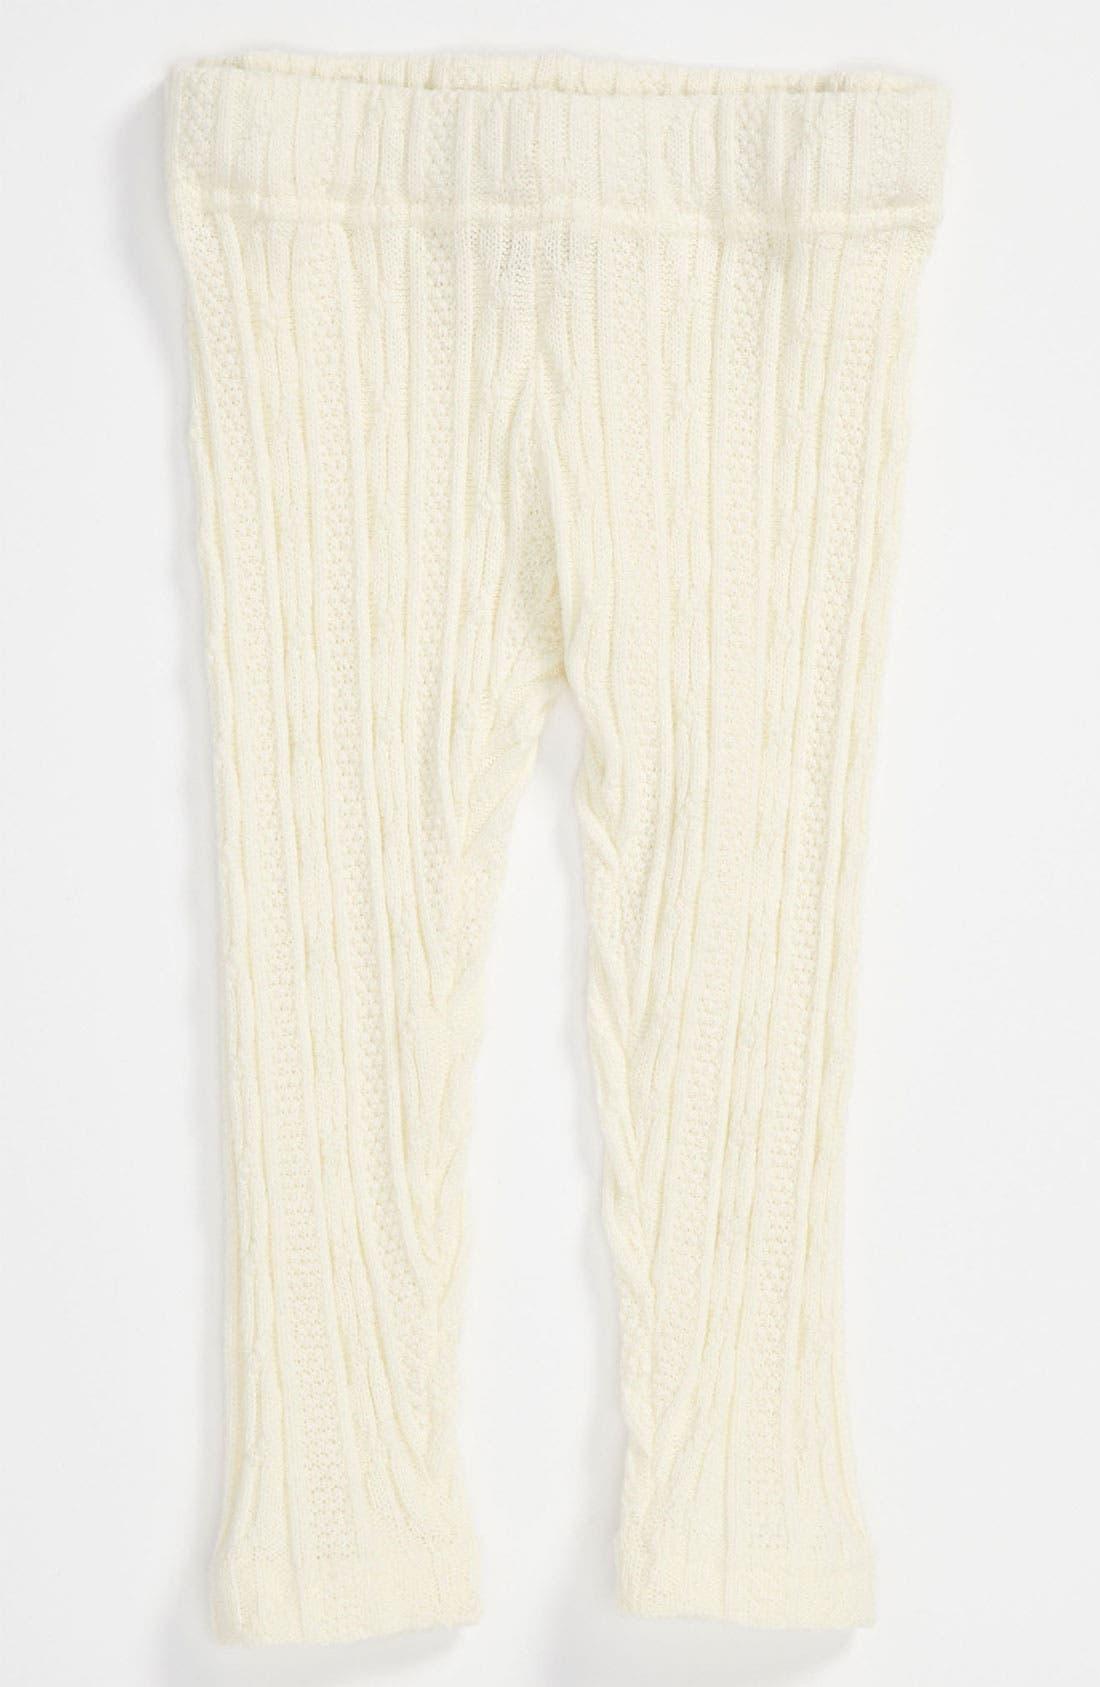 Alternate Image 1 Selected - Tucker + Tate 'Johanna' Cable Knit Leggings (Infant)